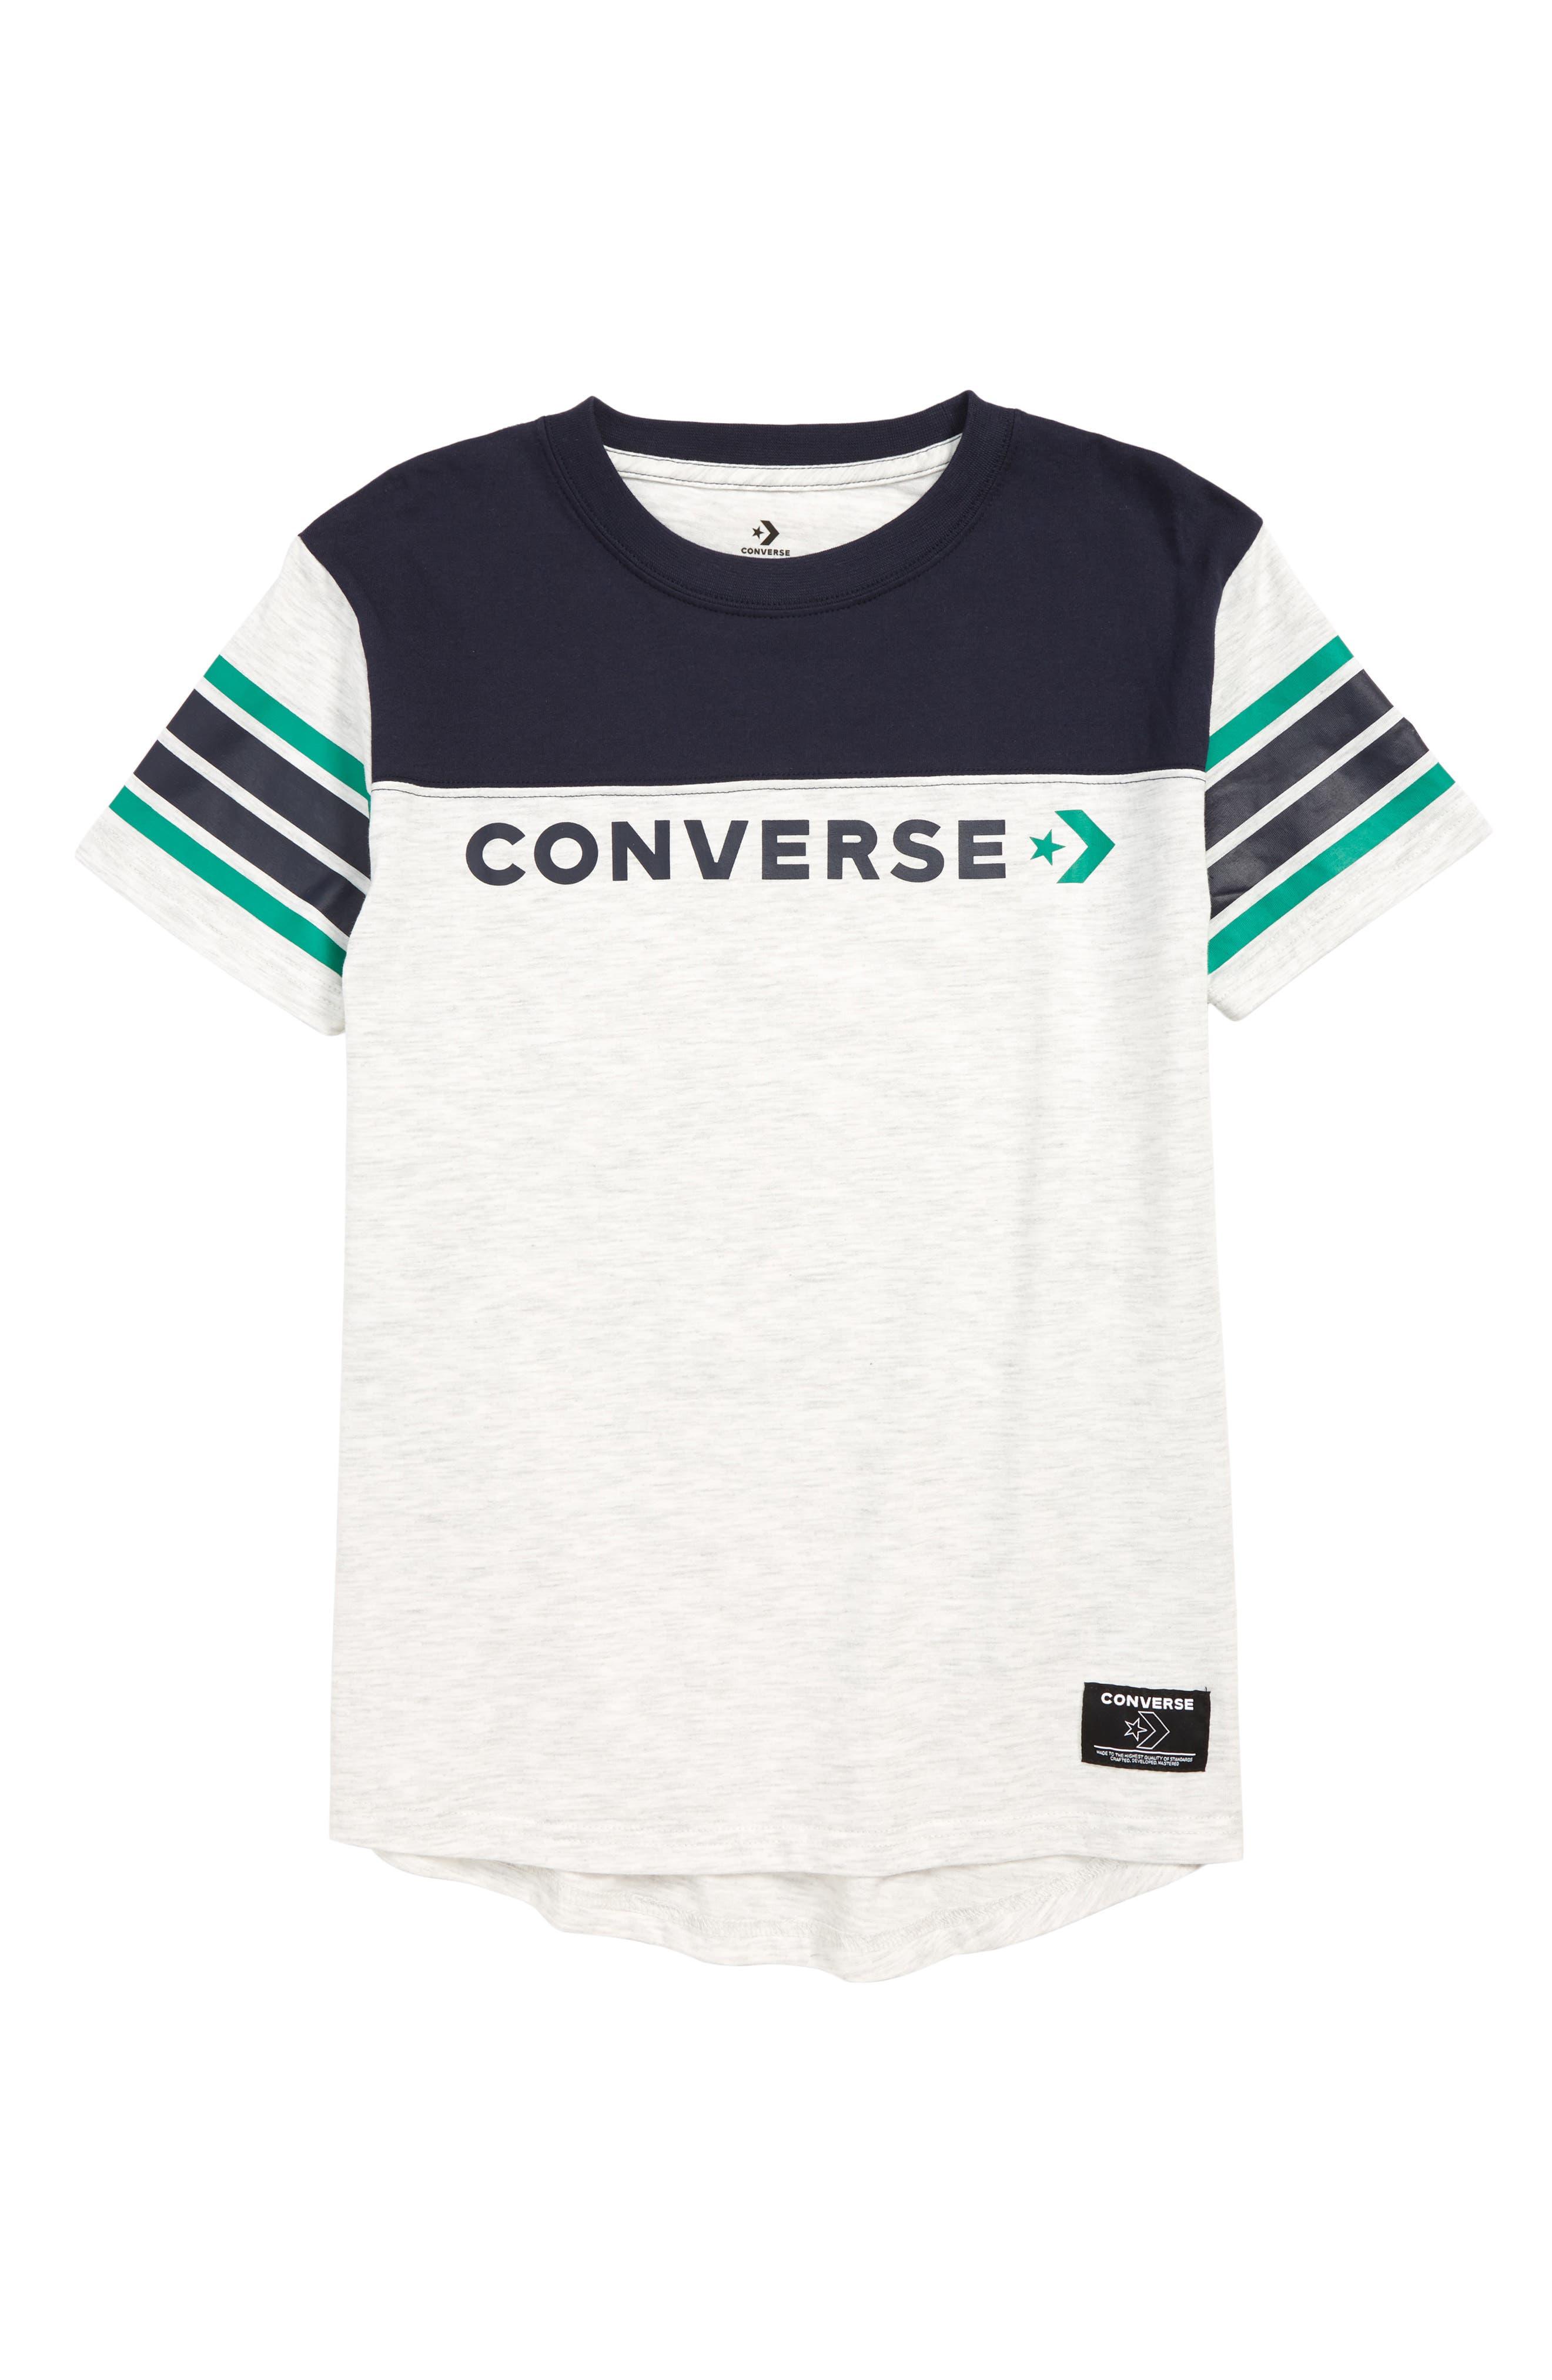 CONVERSE Retro Graphic T-Shirt, Main, color, BIRCH HEATHER